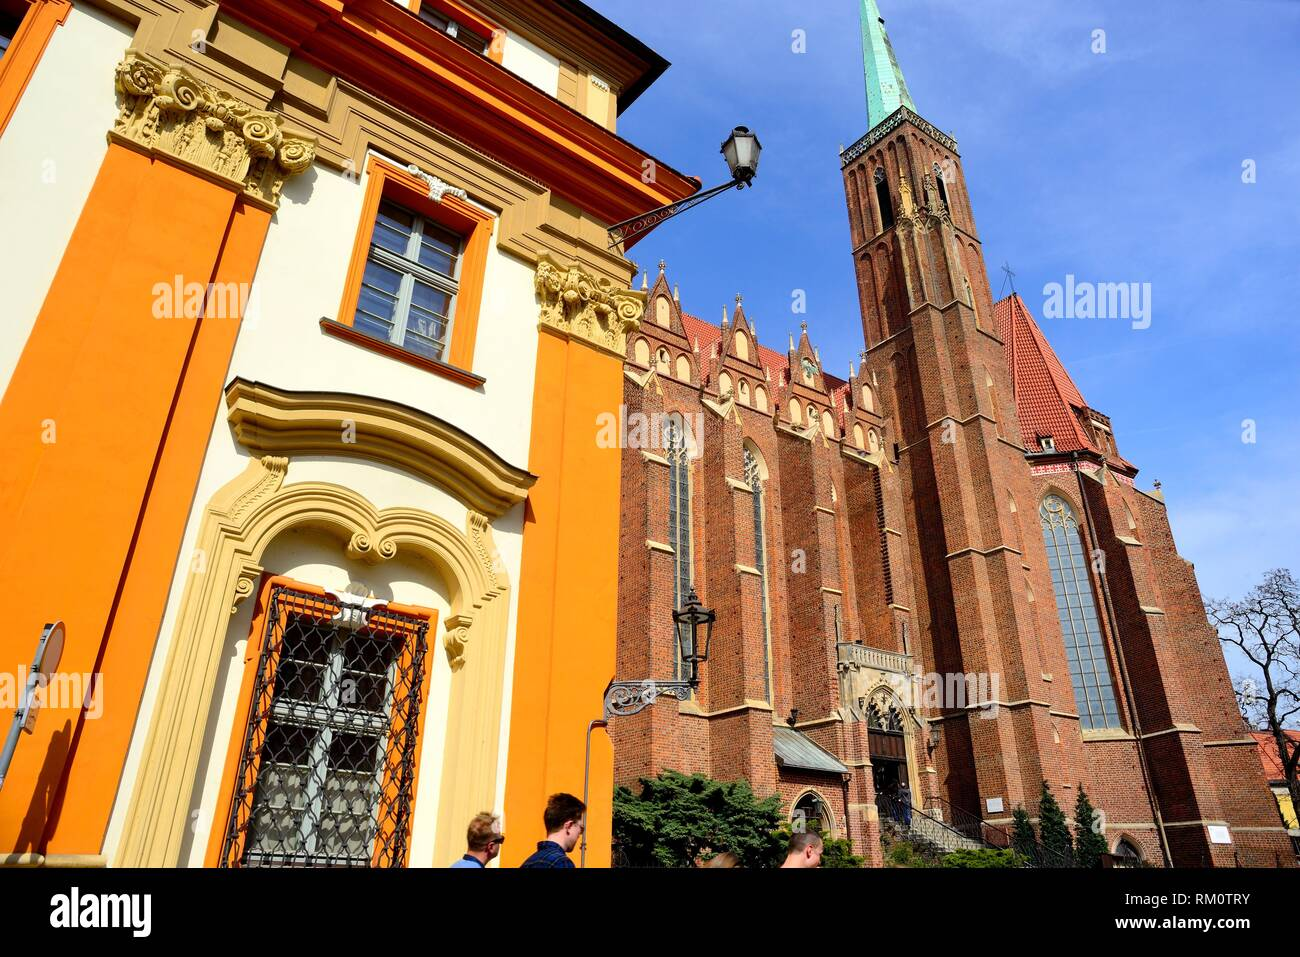 Church of Santa Cruz in the islands of Wroclaw or Breslau, Poland. Stock Photo